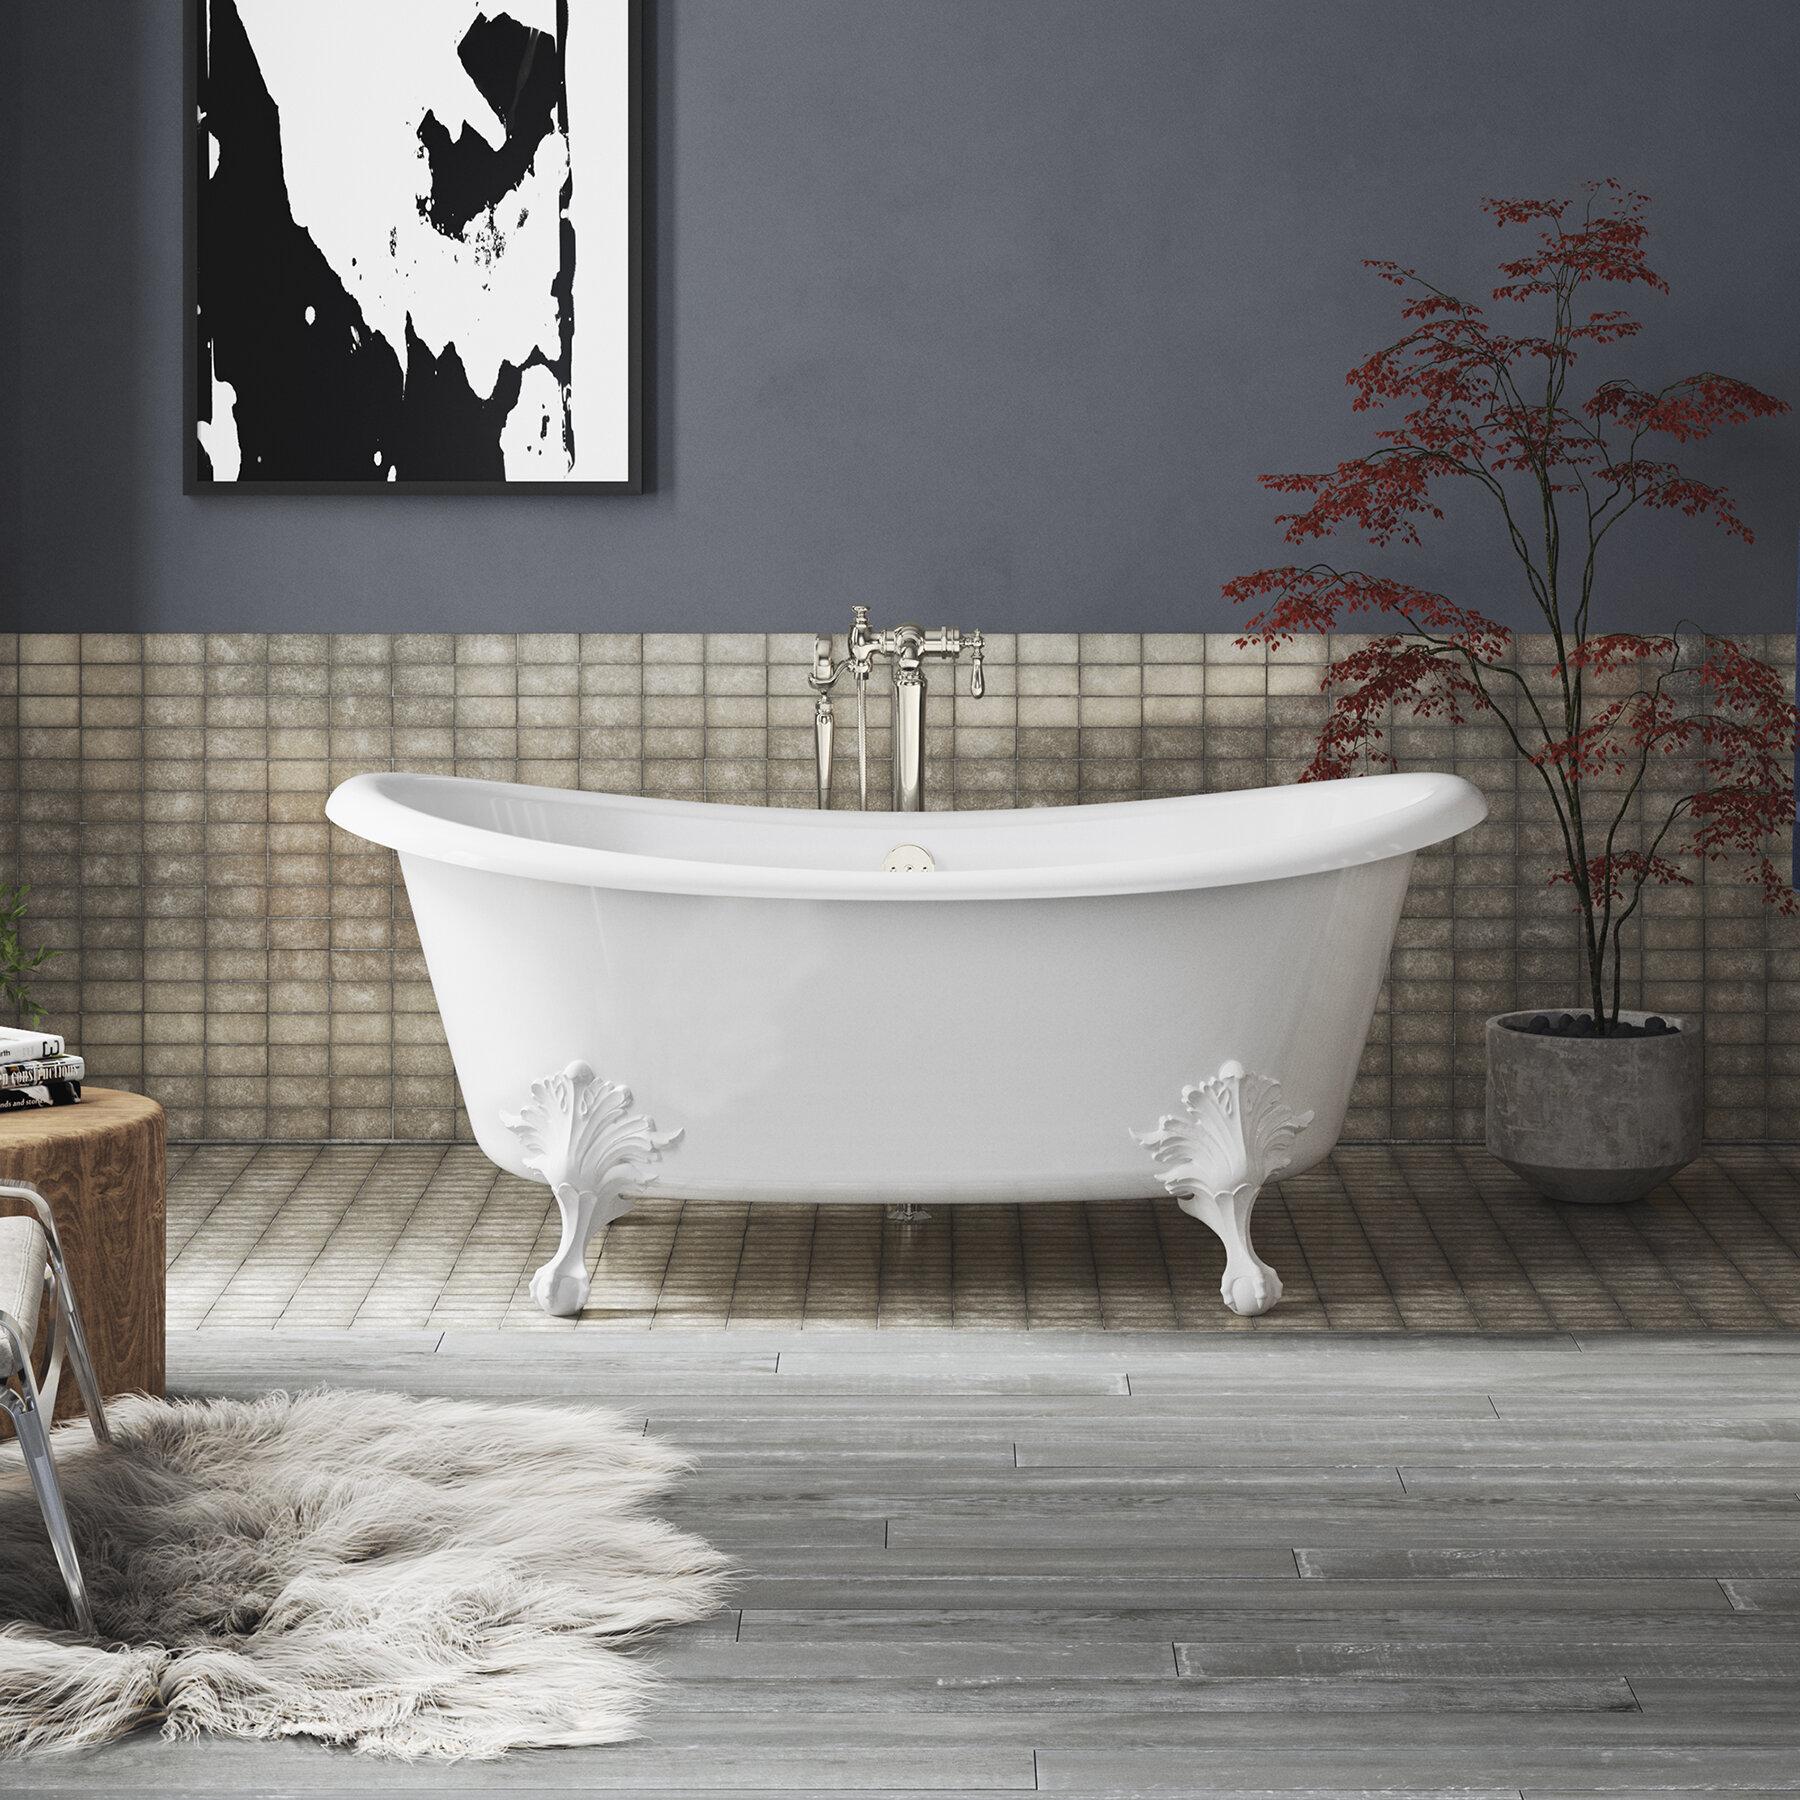 66 X 33 Pedestal Soaking Bathtub